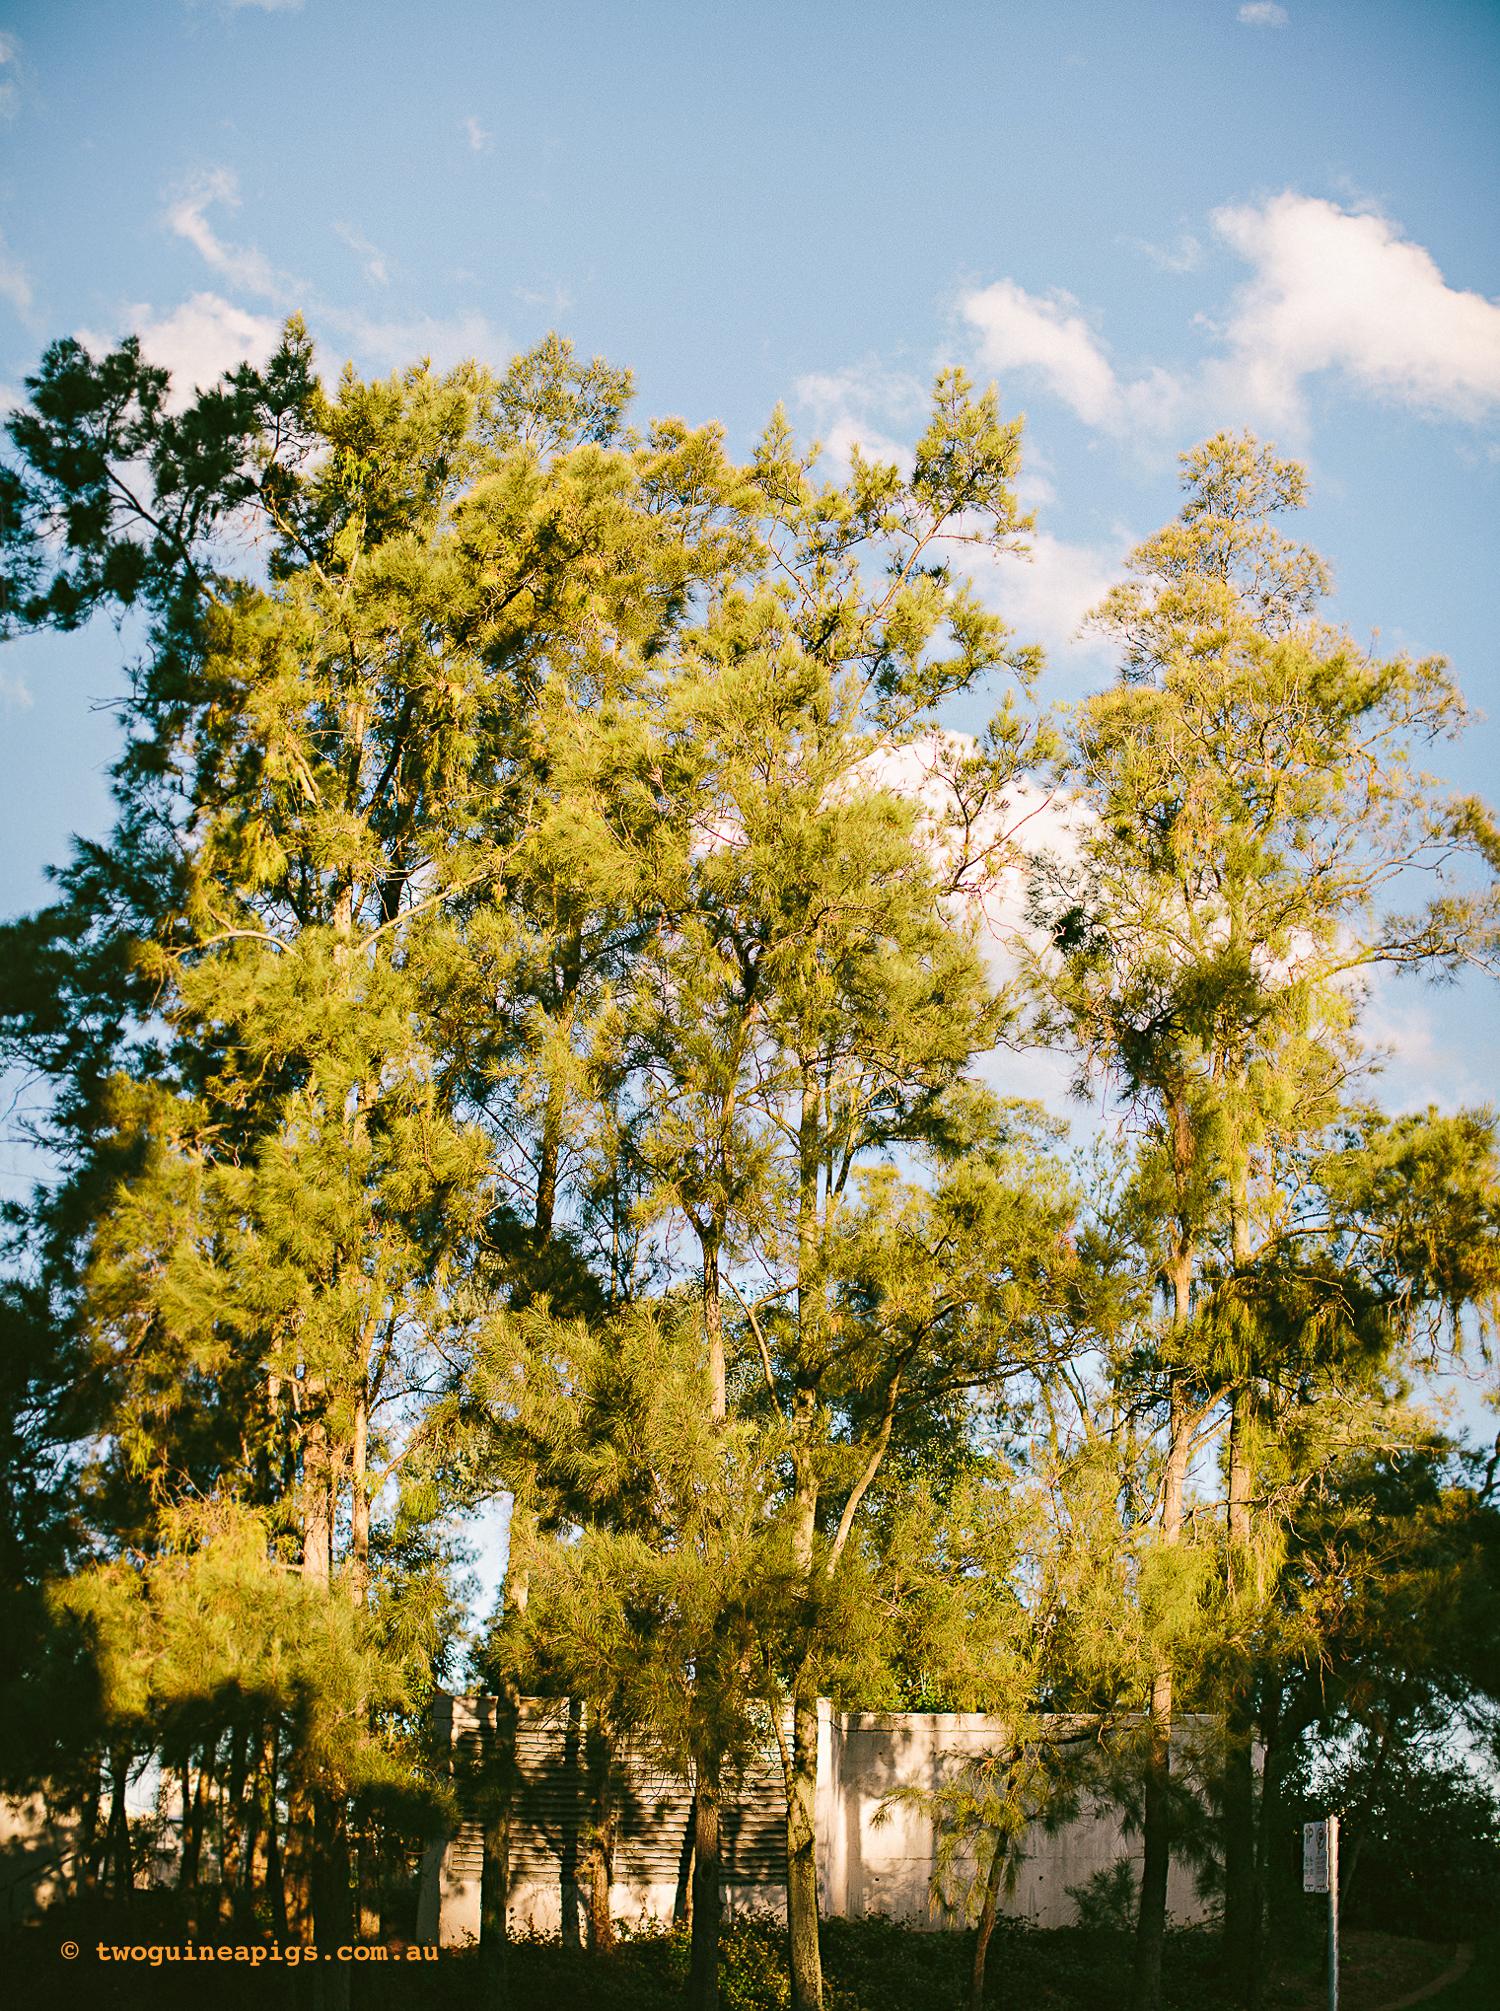 twoguineapigs_pet_photography_potts_point_landscape_stitched